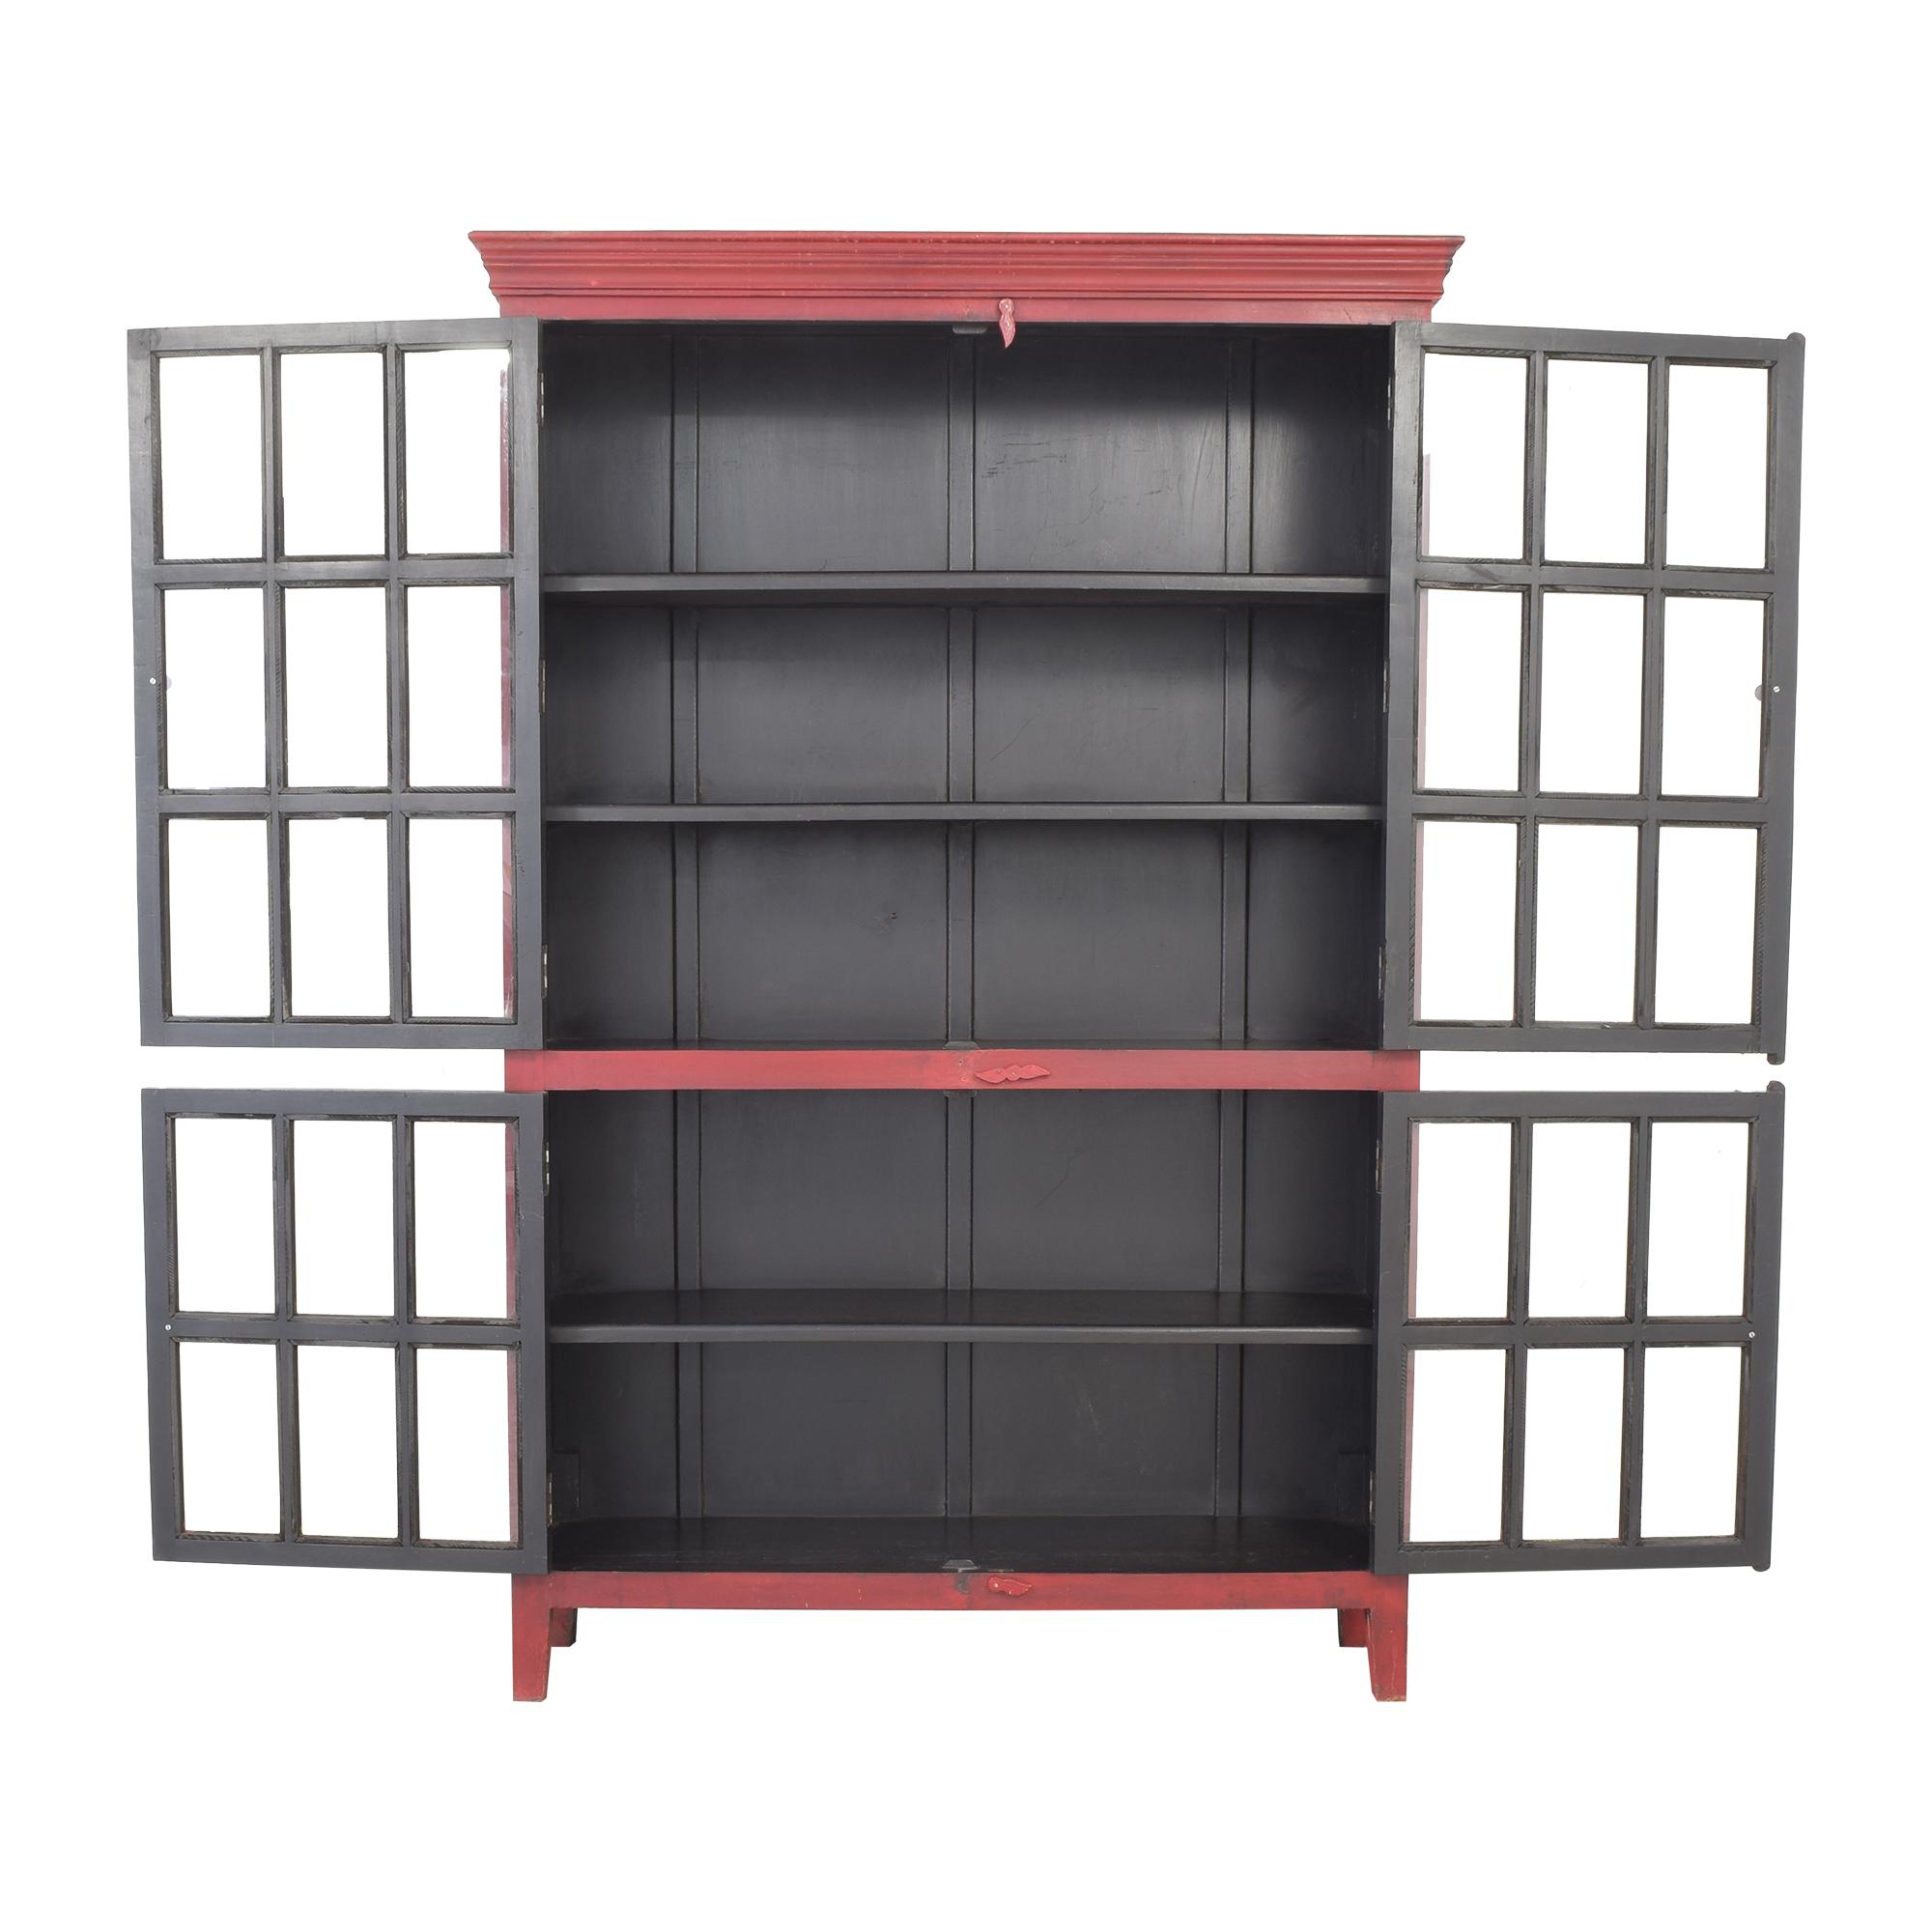 Crate & Barrel Crate & Barrel Hutch Storage